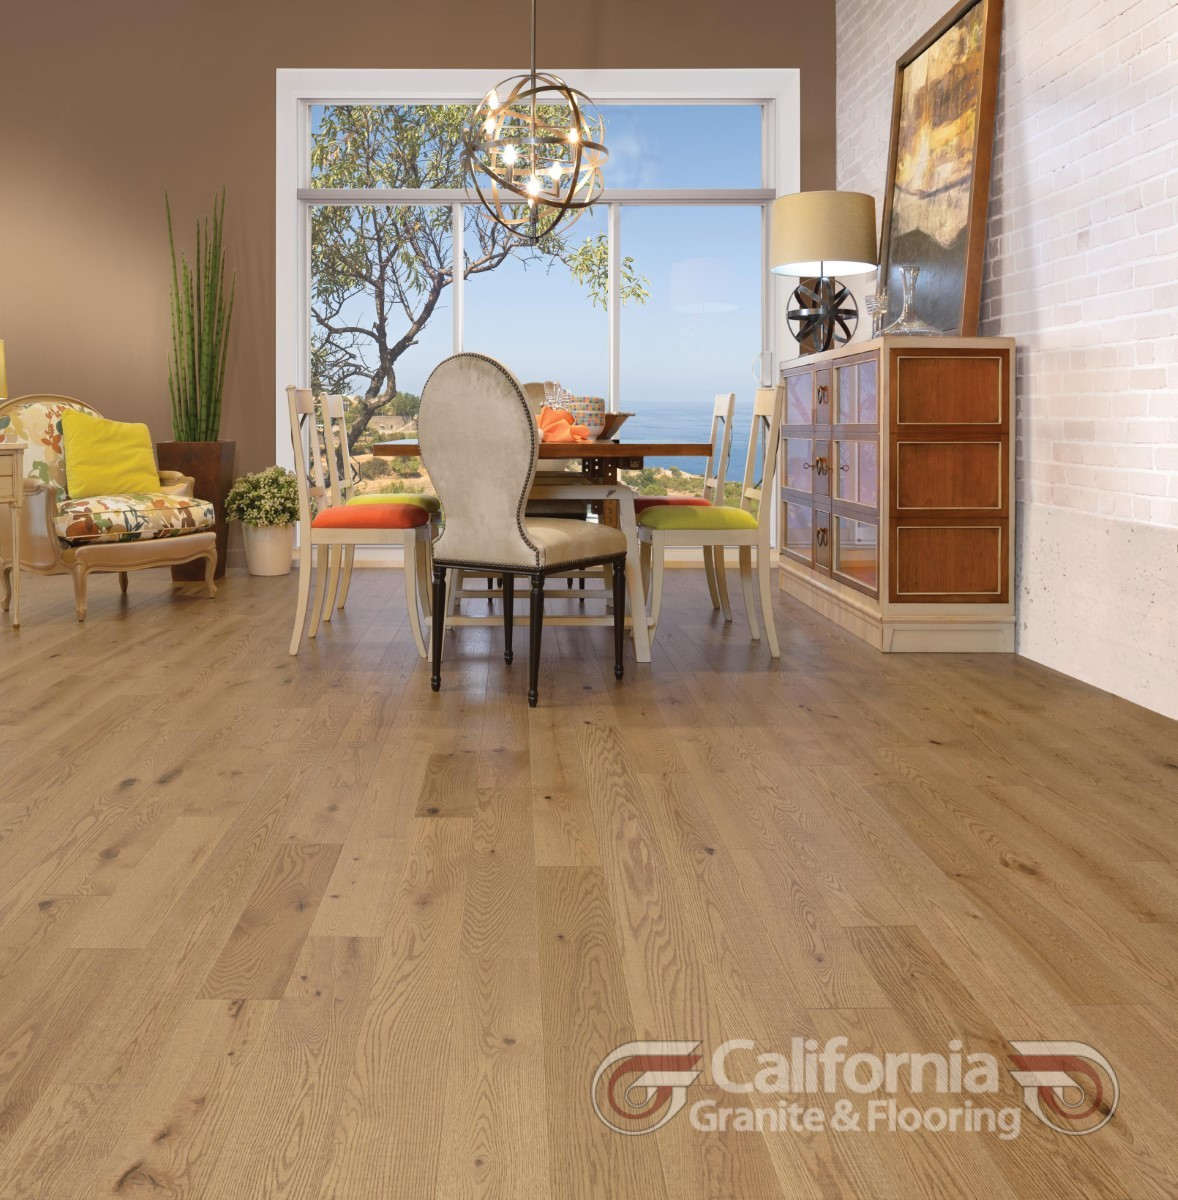 hardwood-flooring-red-oak-papyrus-character-cork-look-1